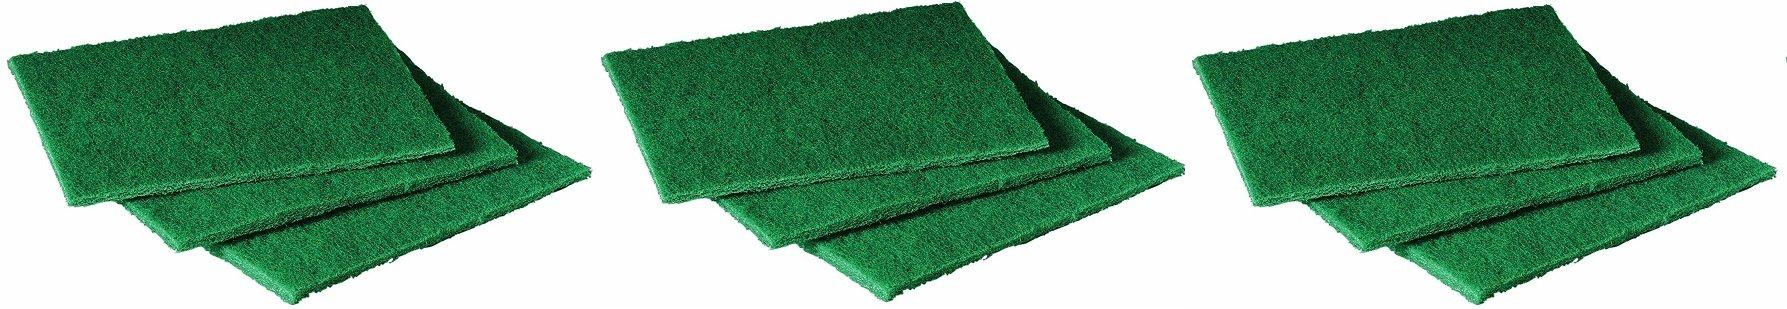 Scotch-Brite 105 General Purpose Scouring Pad, 6'' Length x 4-1/2'' Width, Green (Case of 40) (3-Case of 40))